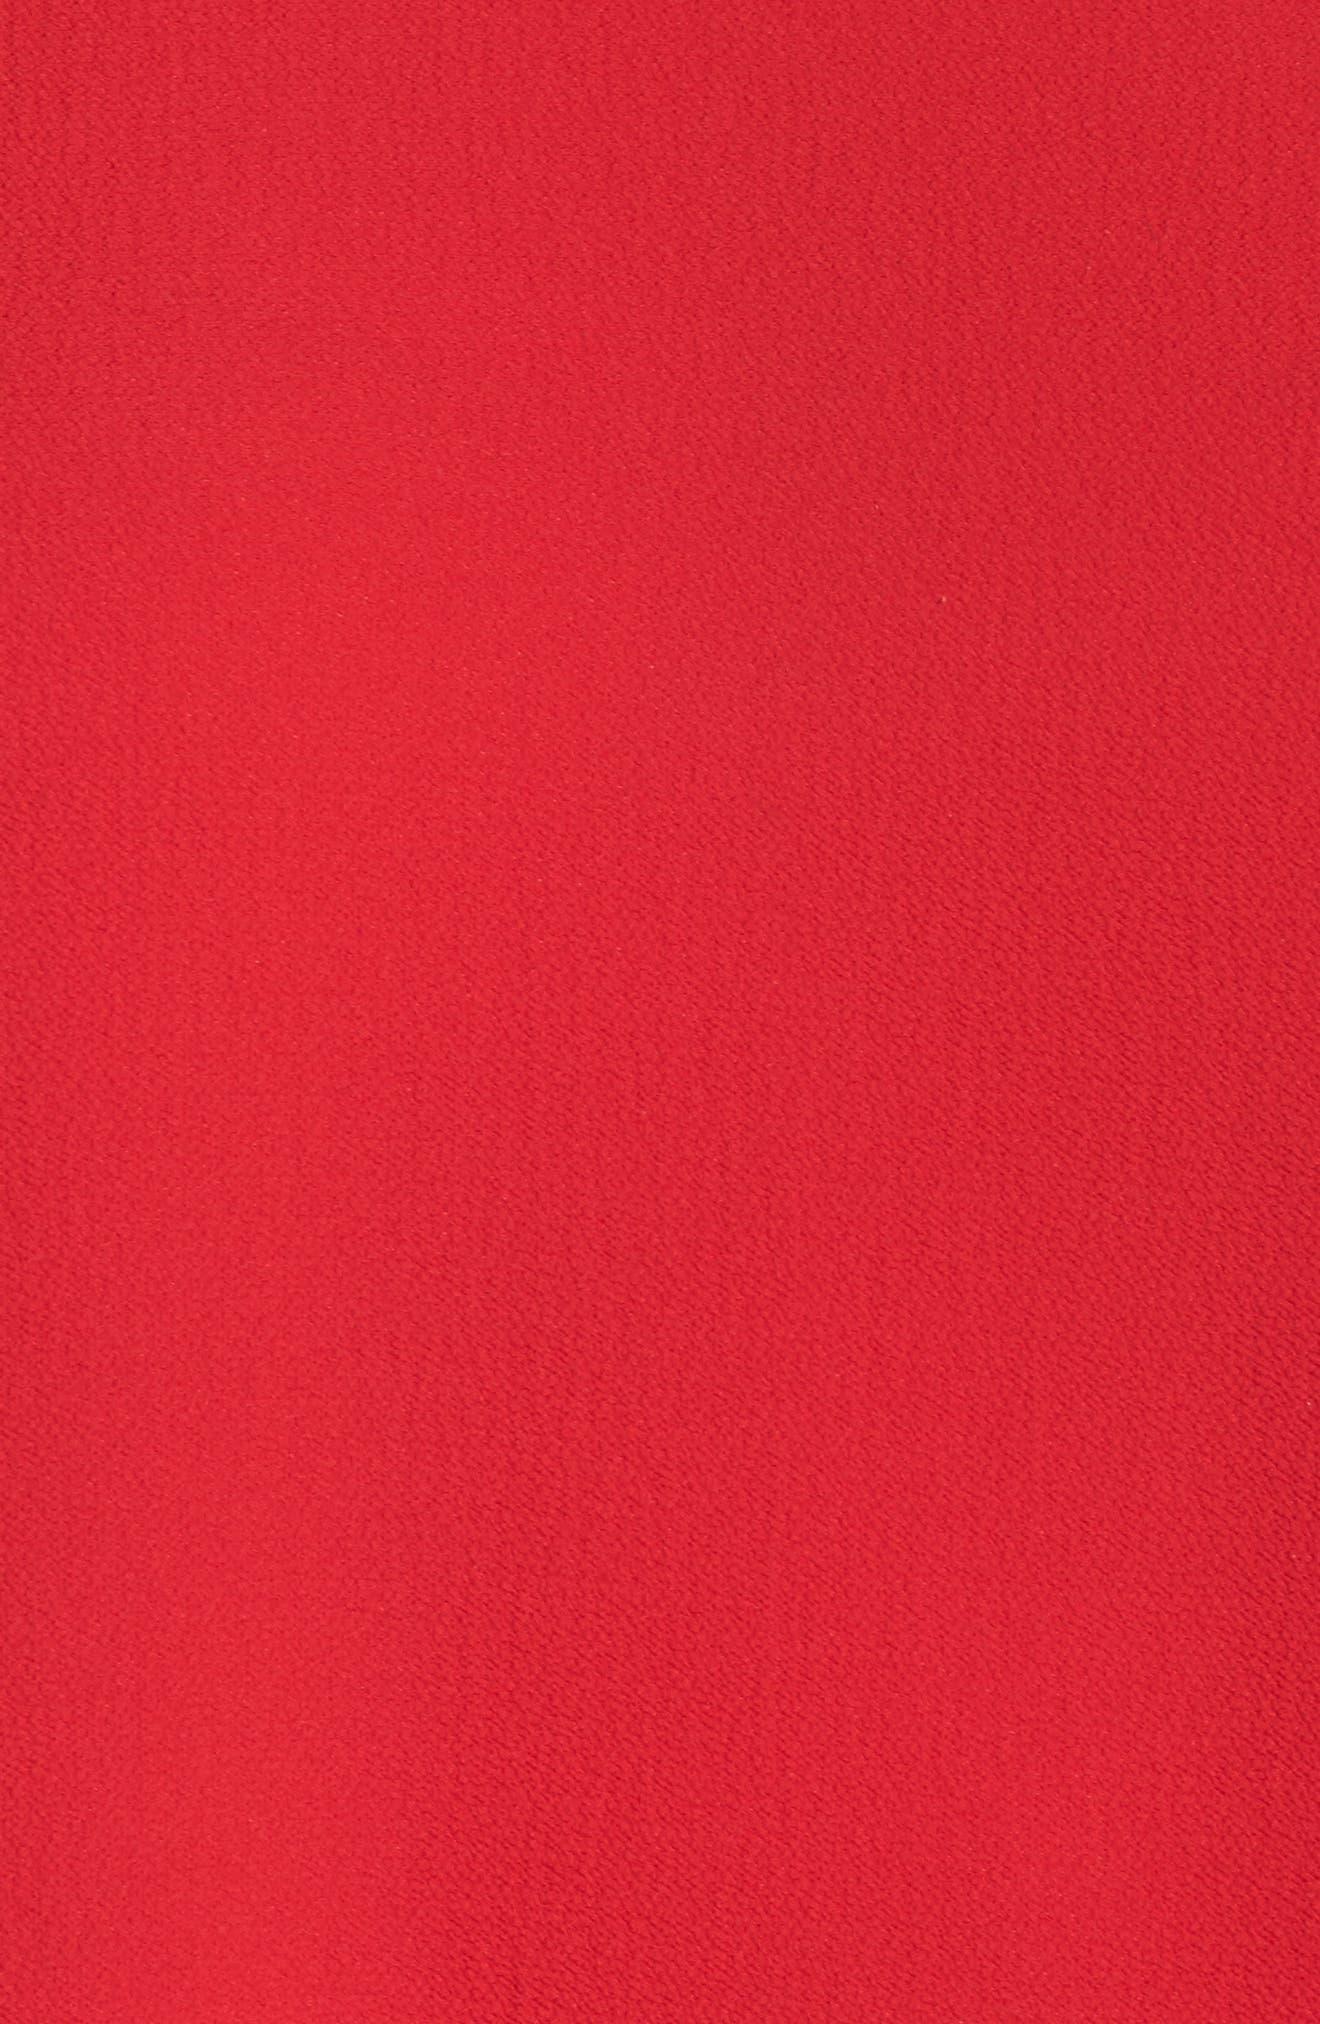 Bell Sleeve Blouse,                             Alternate thumbnail 22, color,